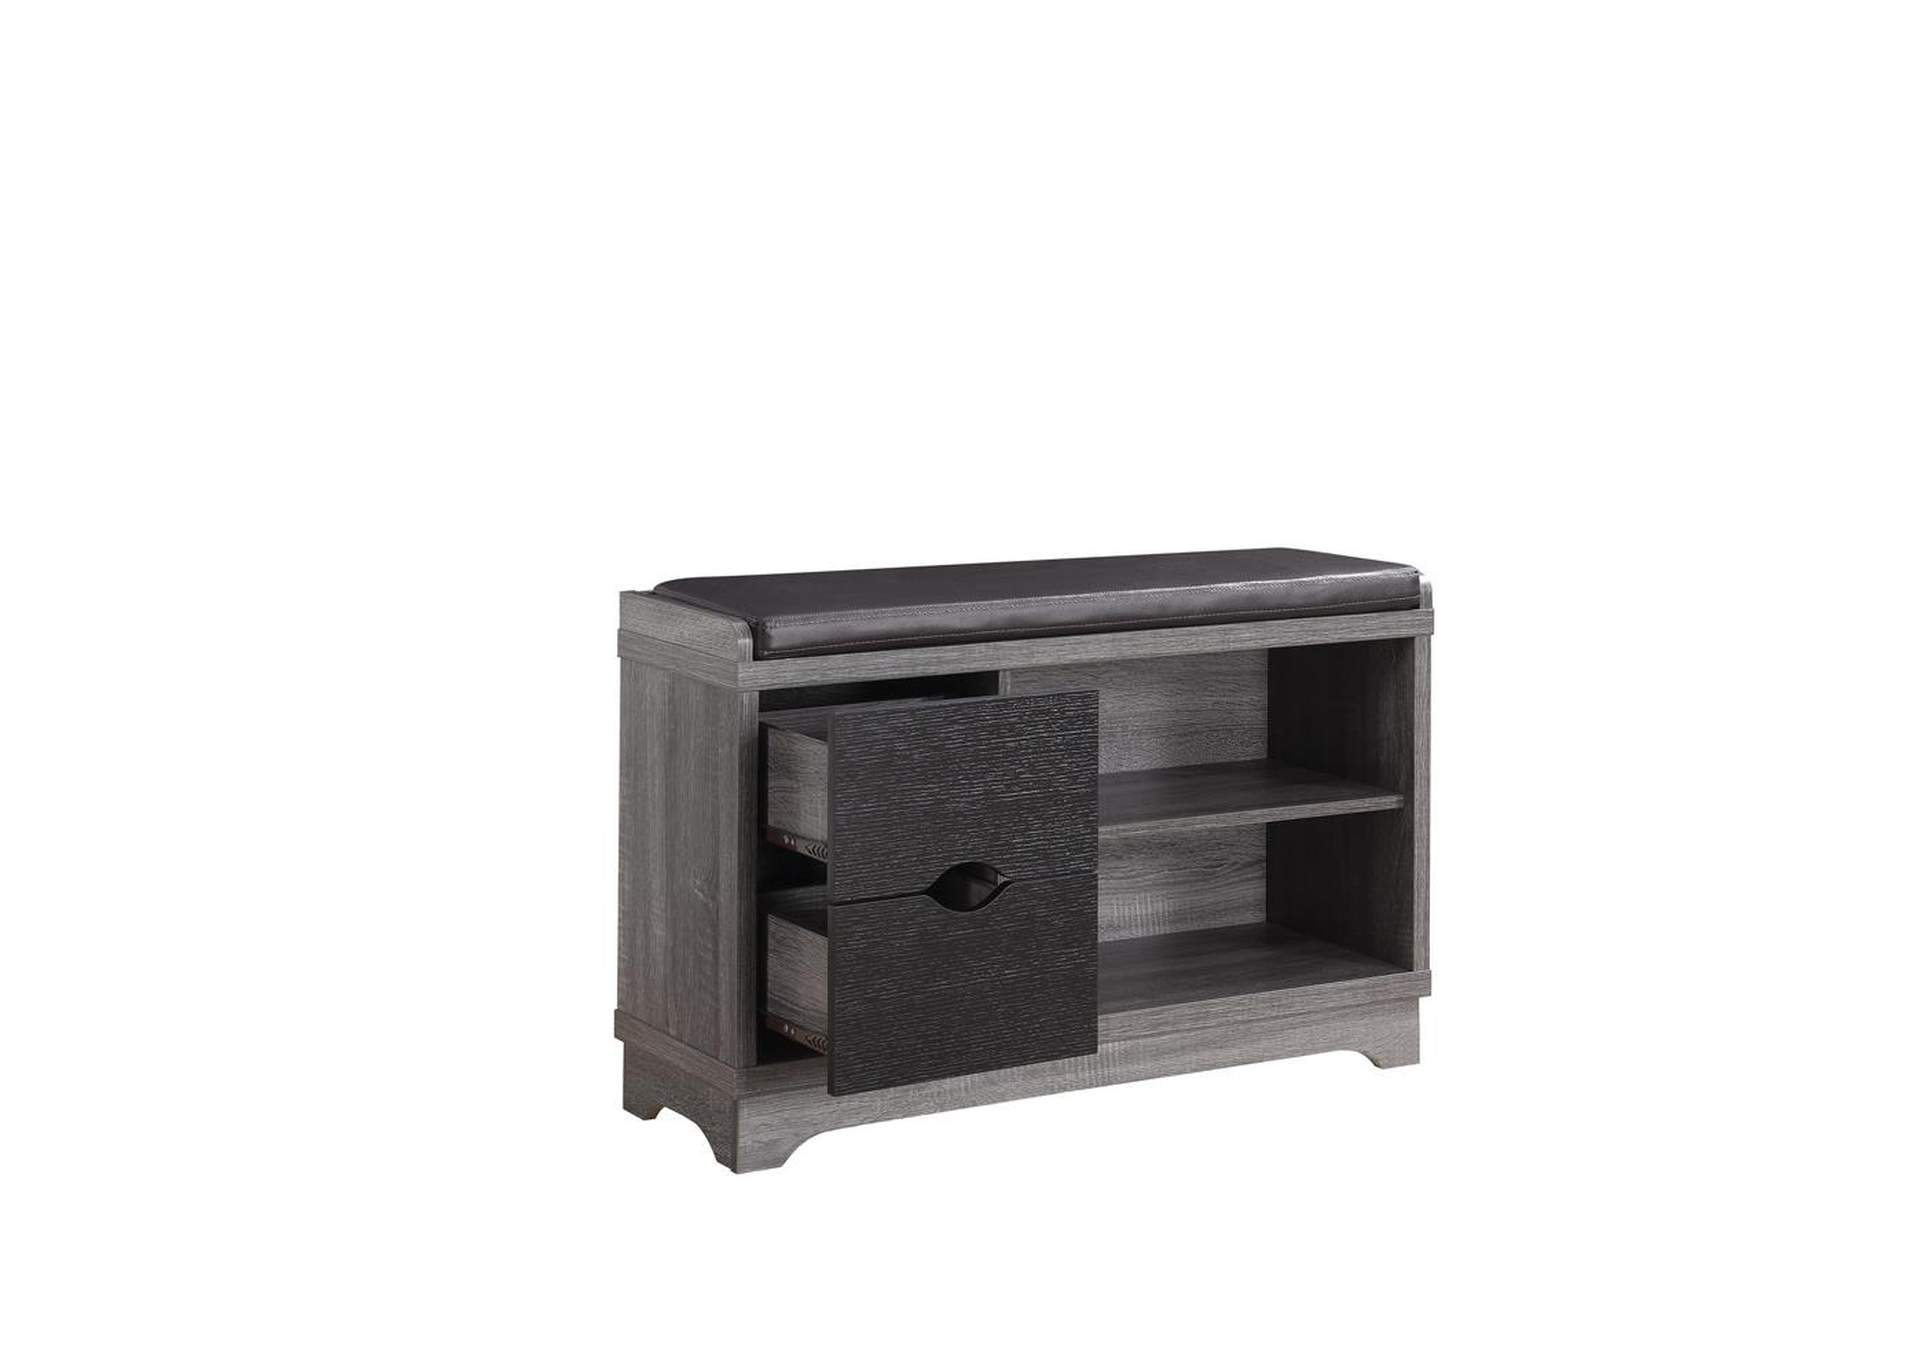 Stewart Williams Furniture Rustic Distressed Grey Shoe Cabinet